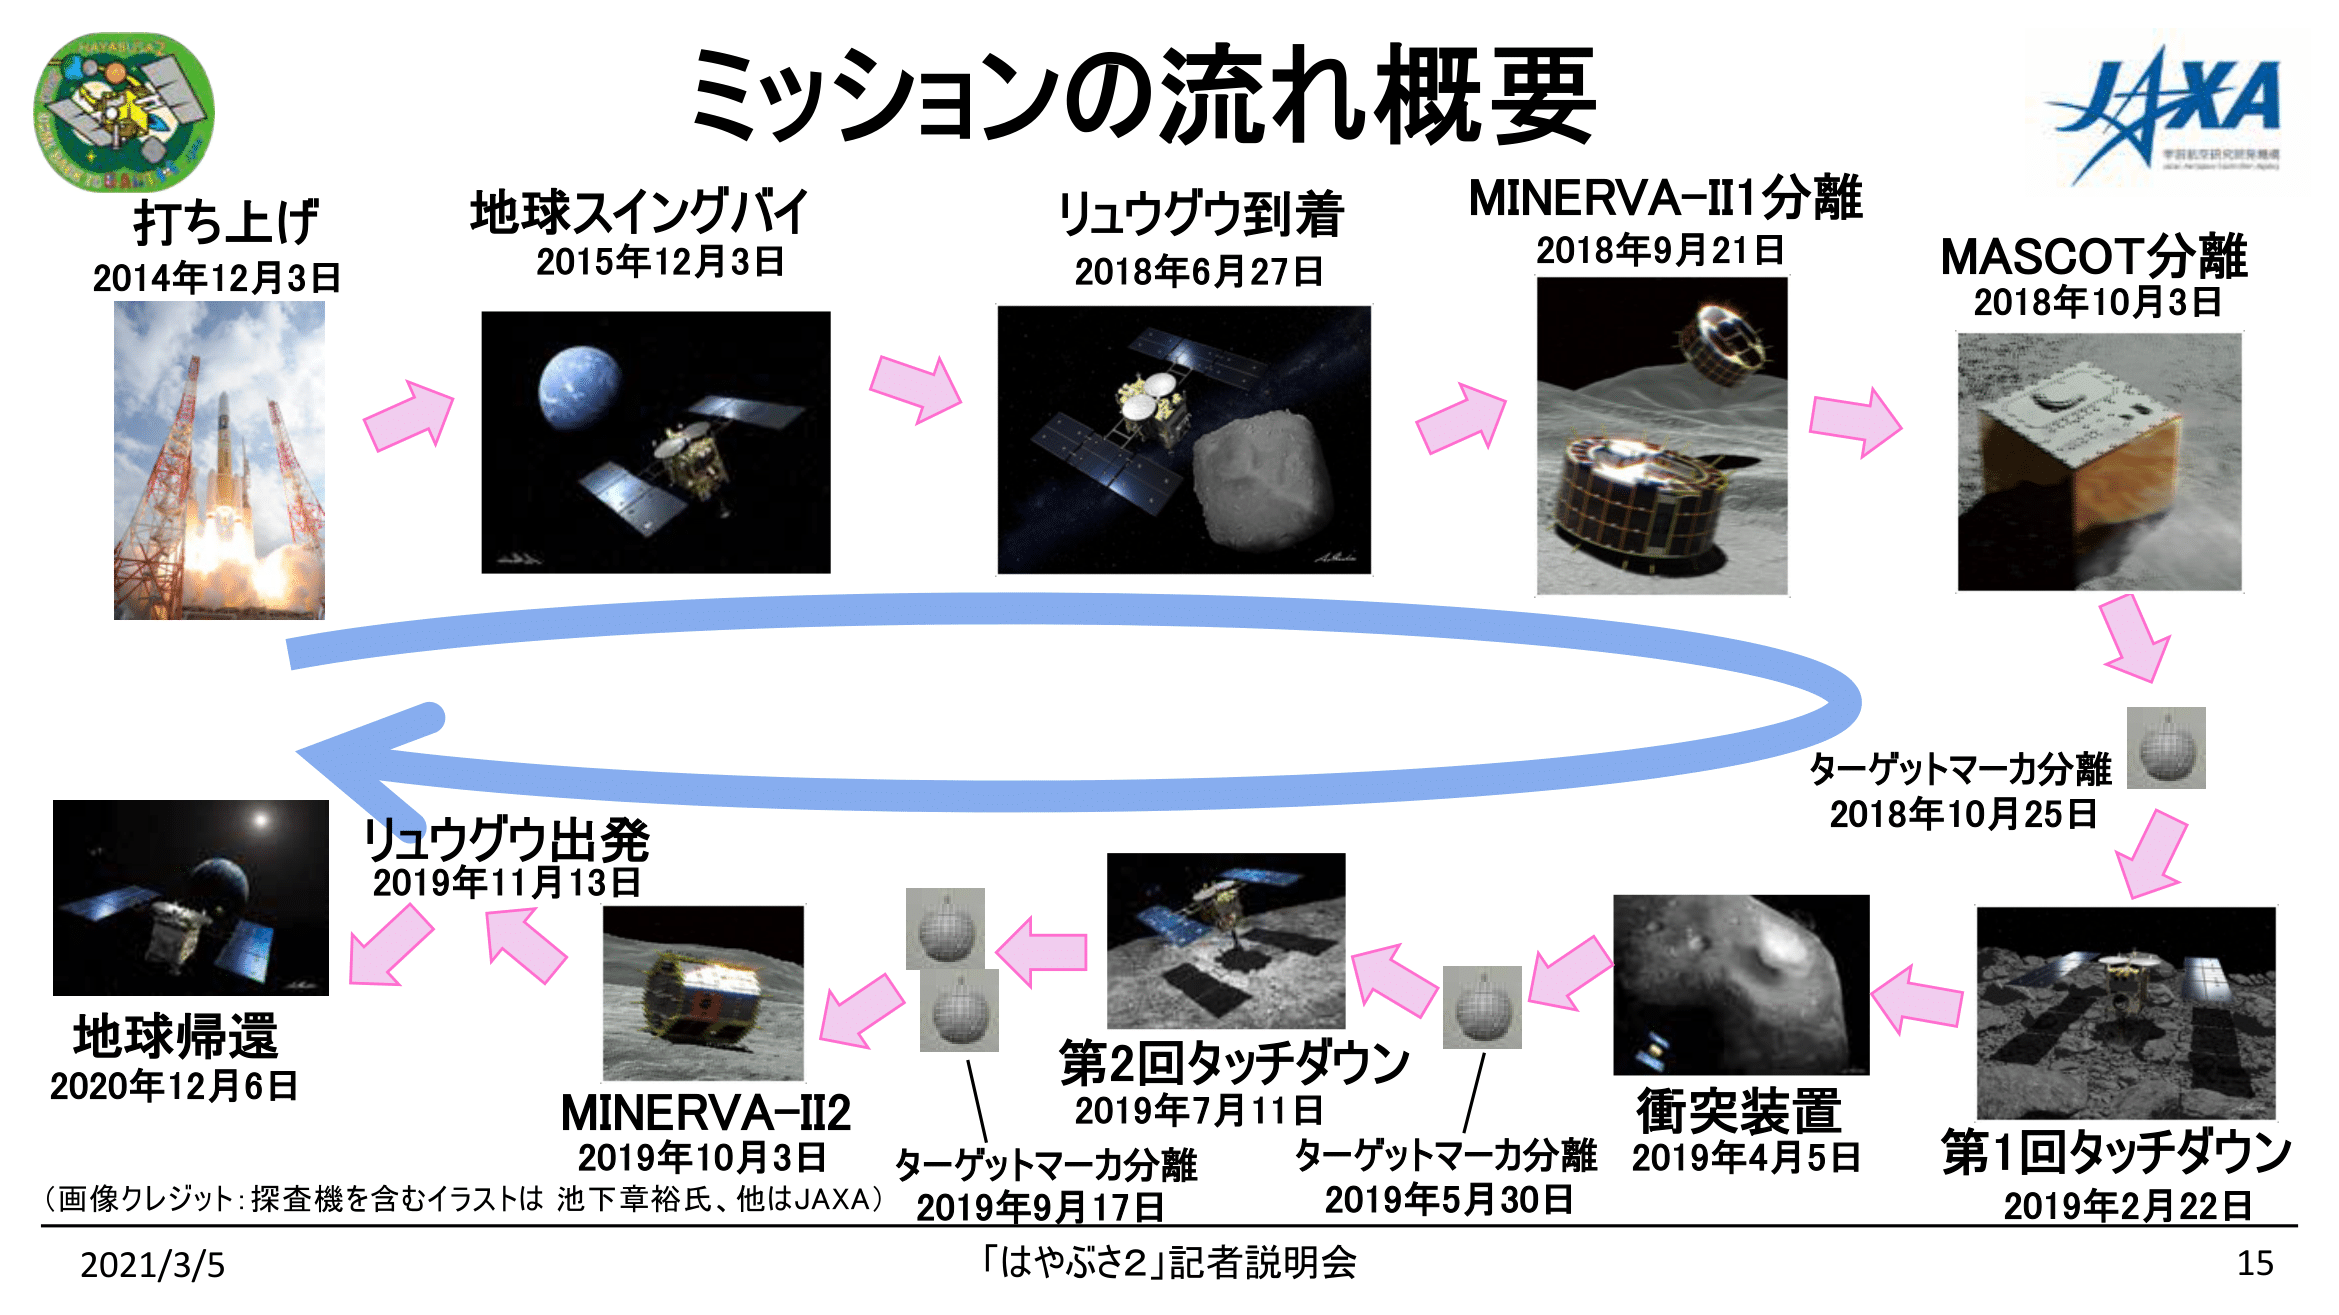 f:id:Imamura:20210305134243p:plain